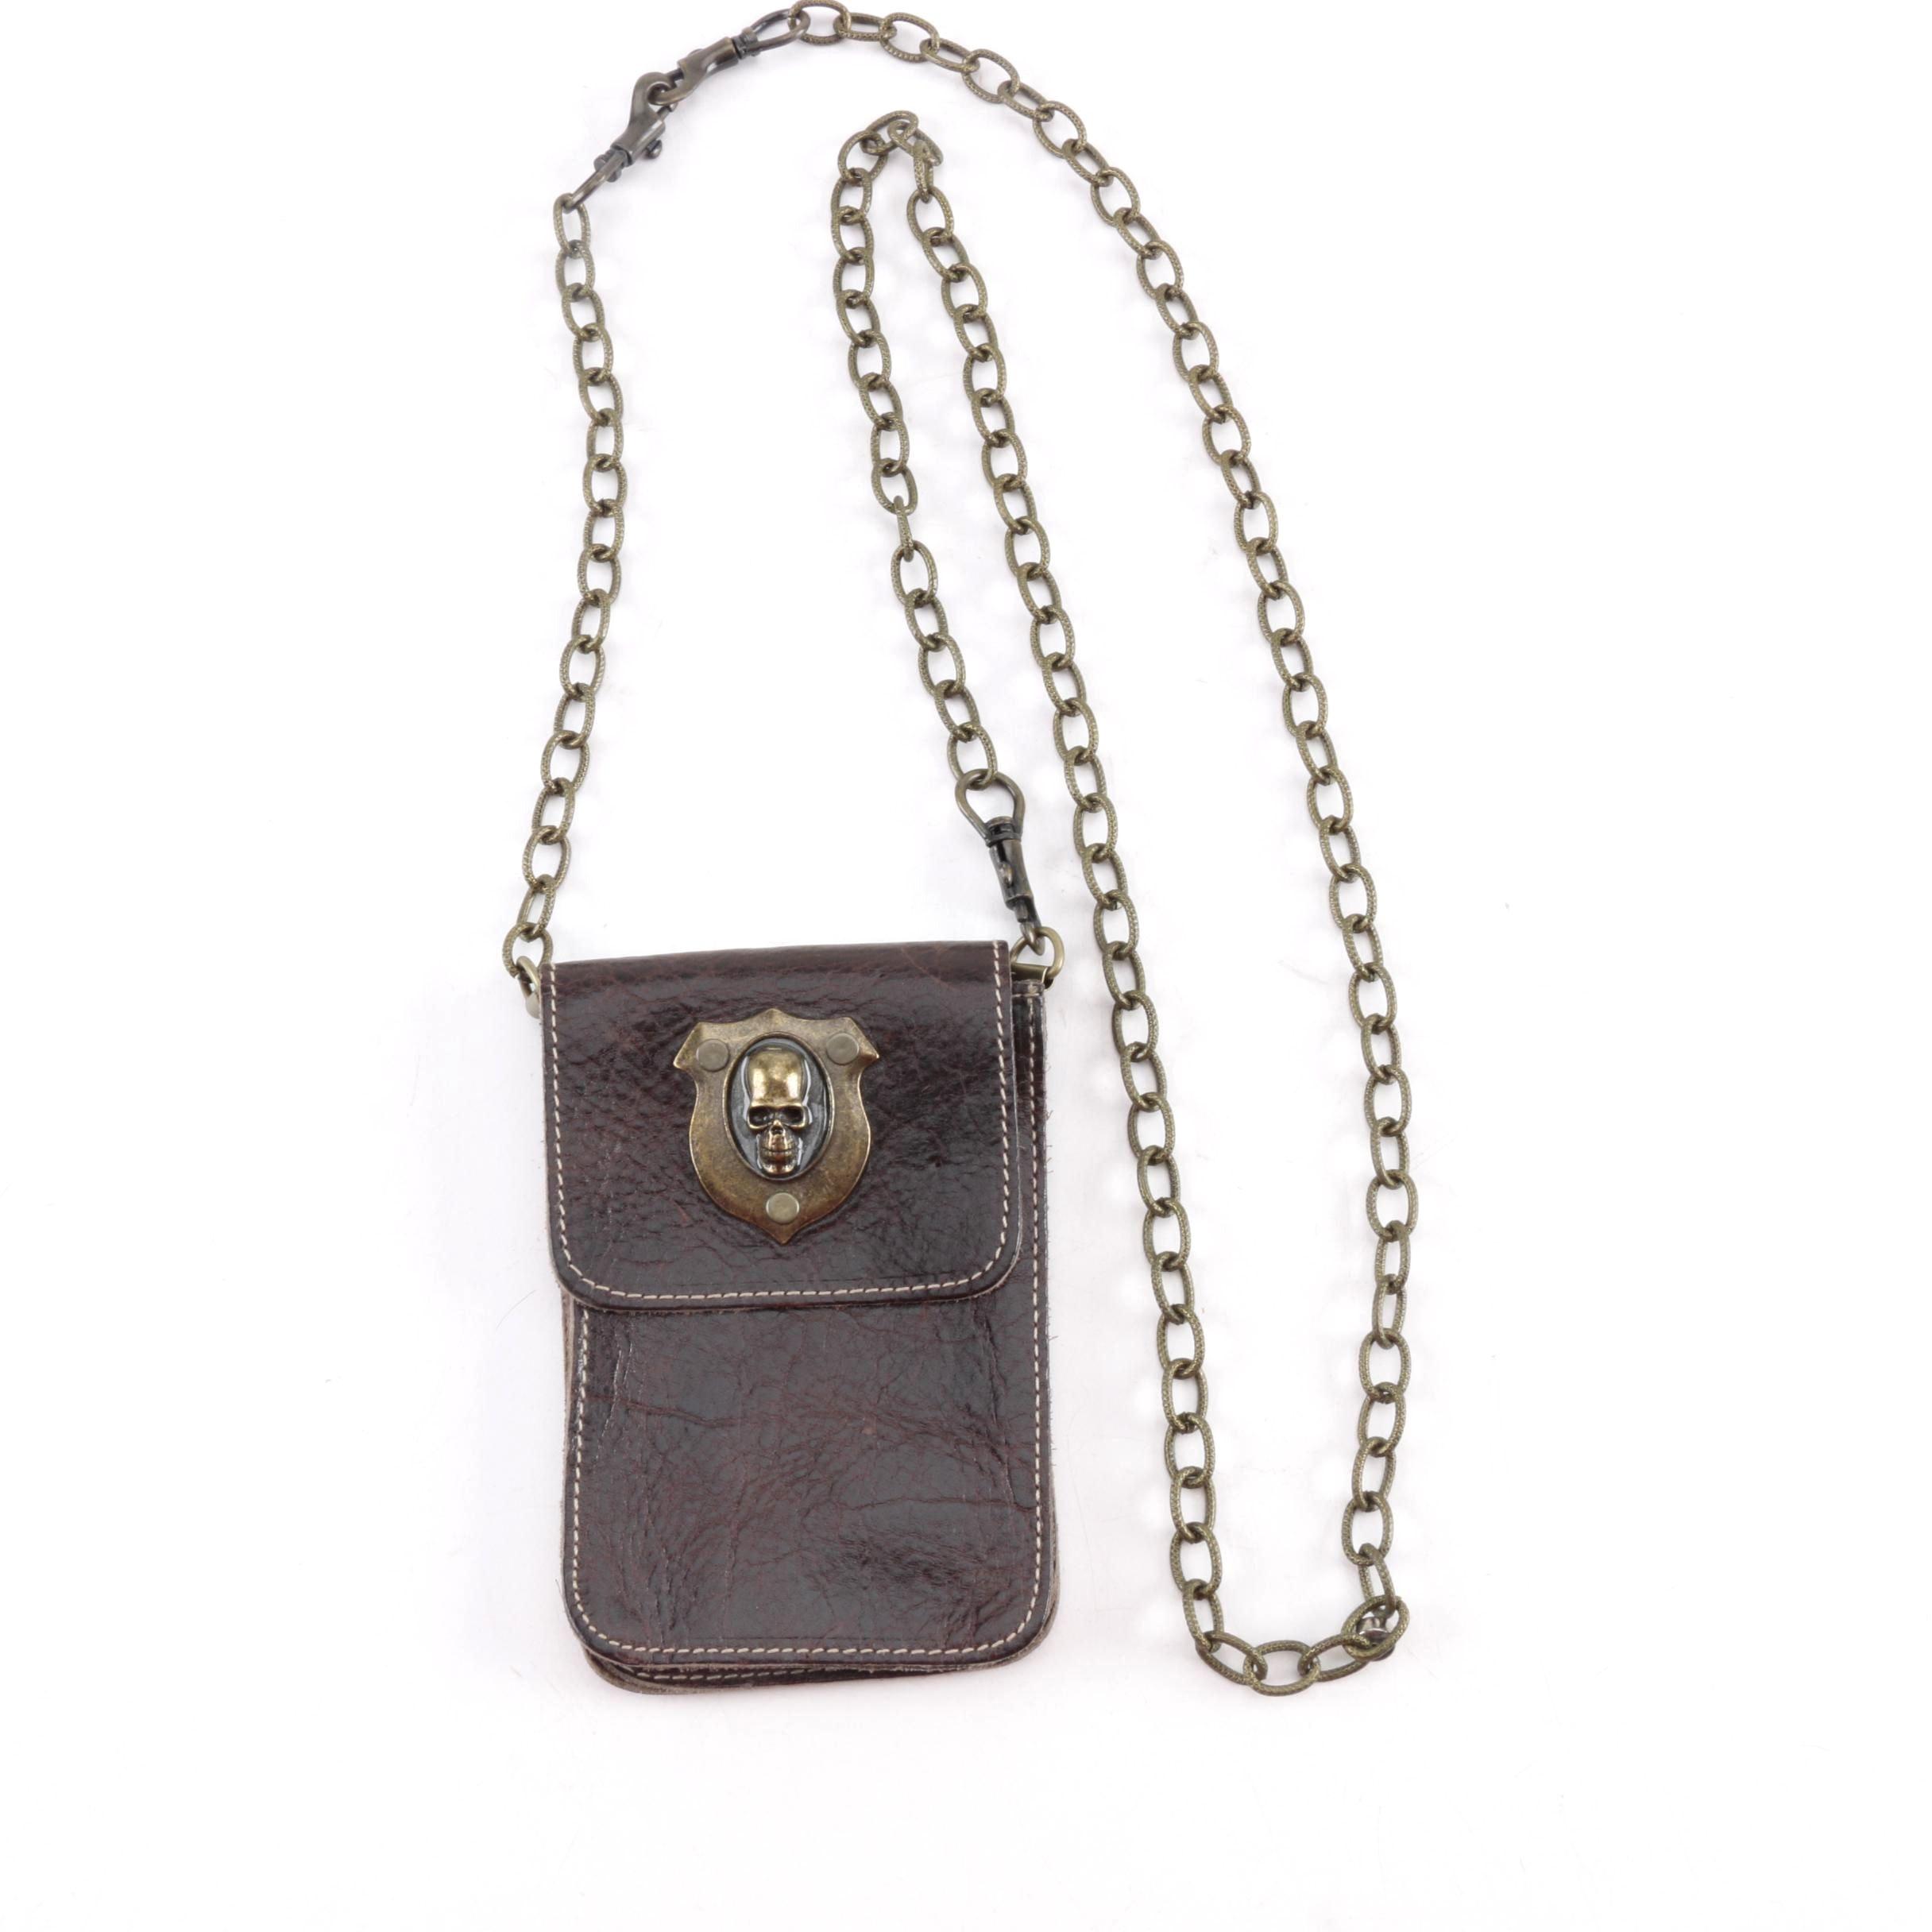 KBD Studio Handcrafted Leather Crossbody Handbag